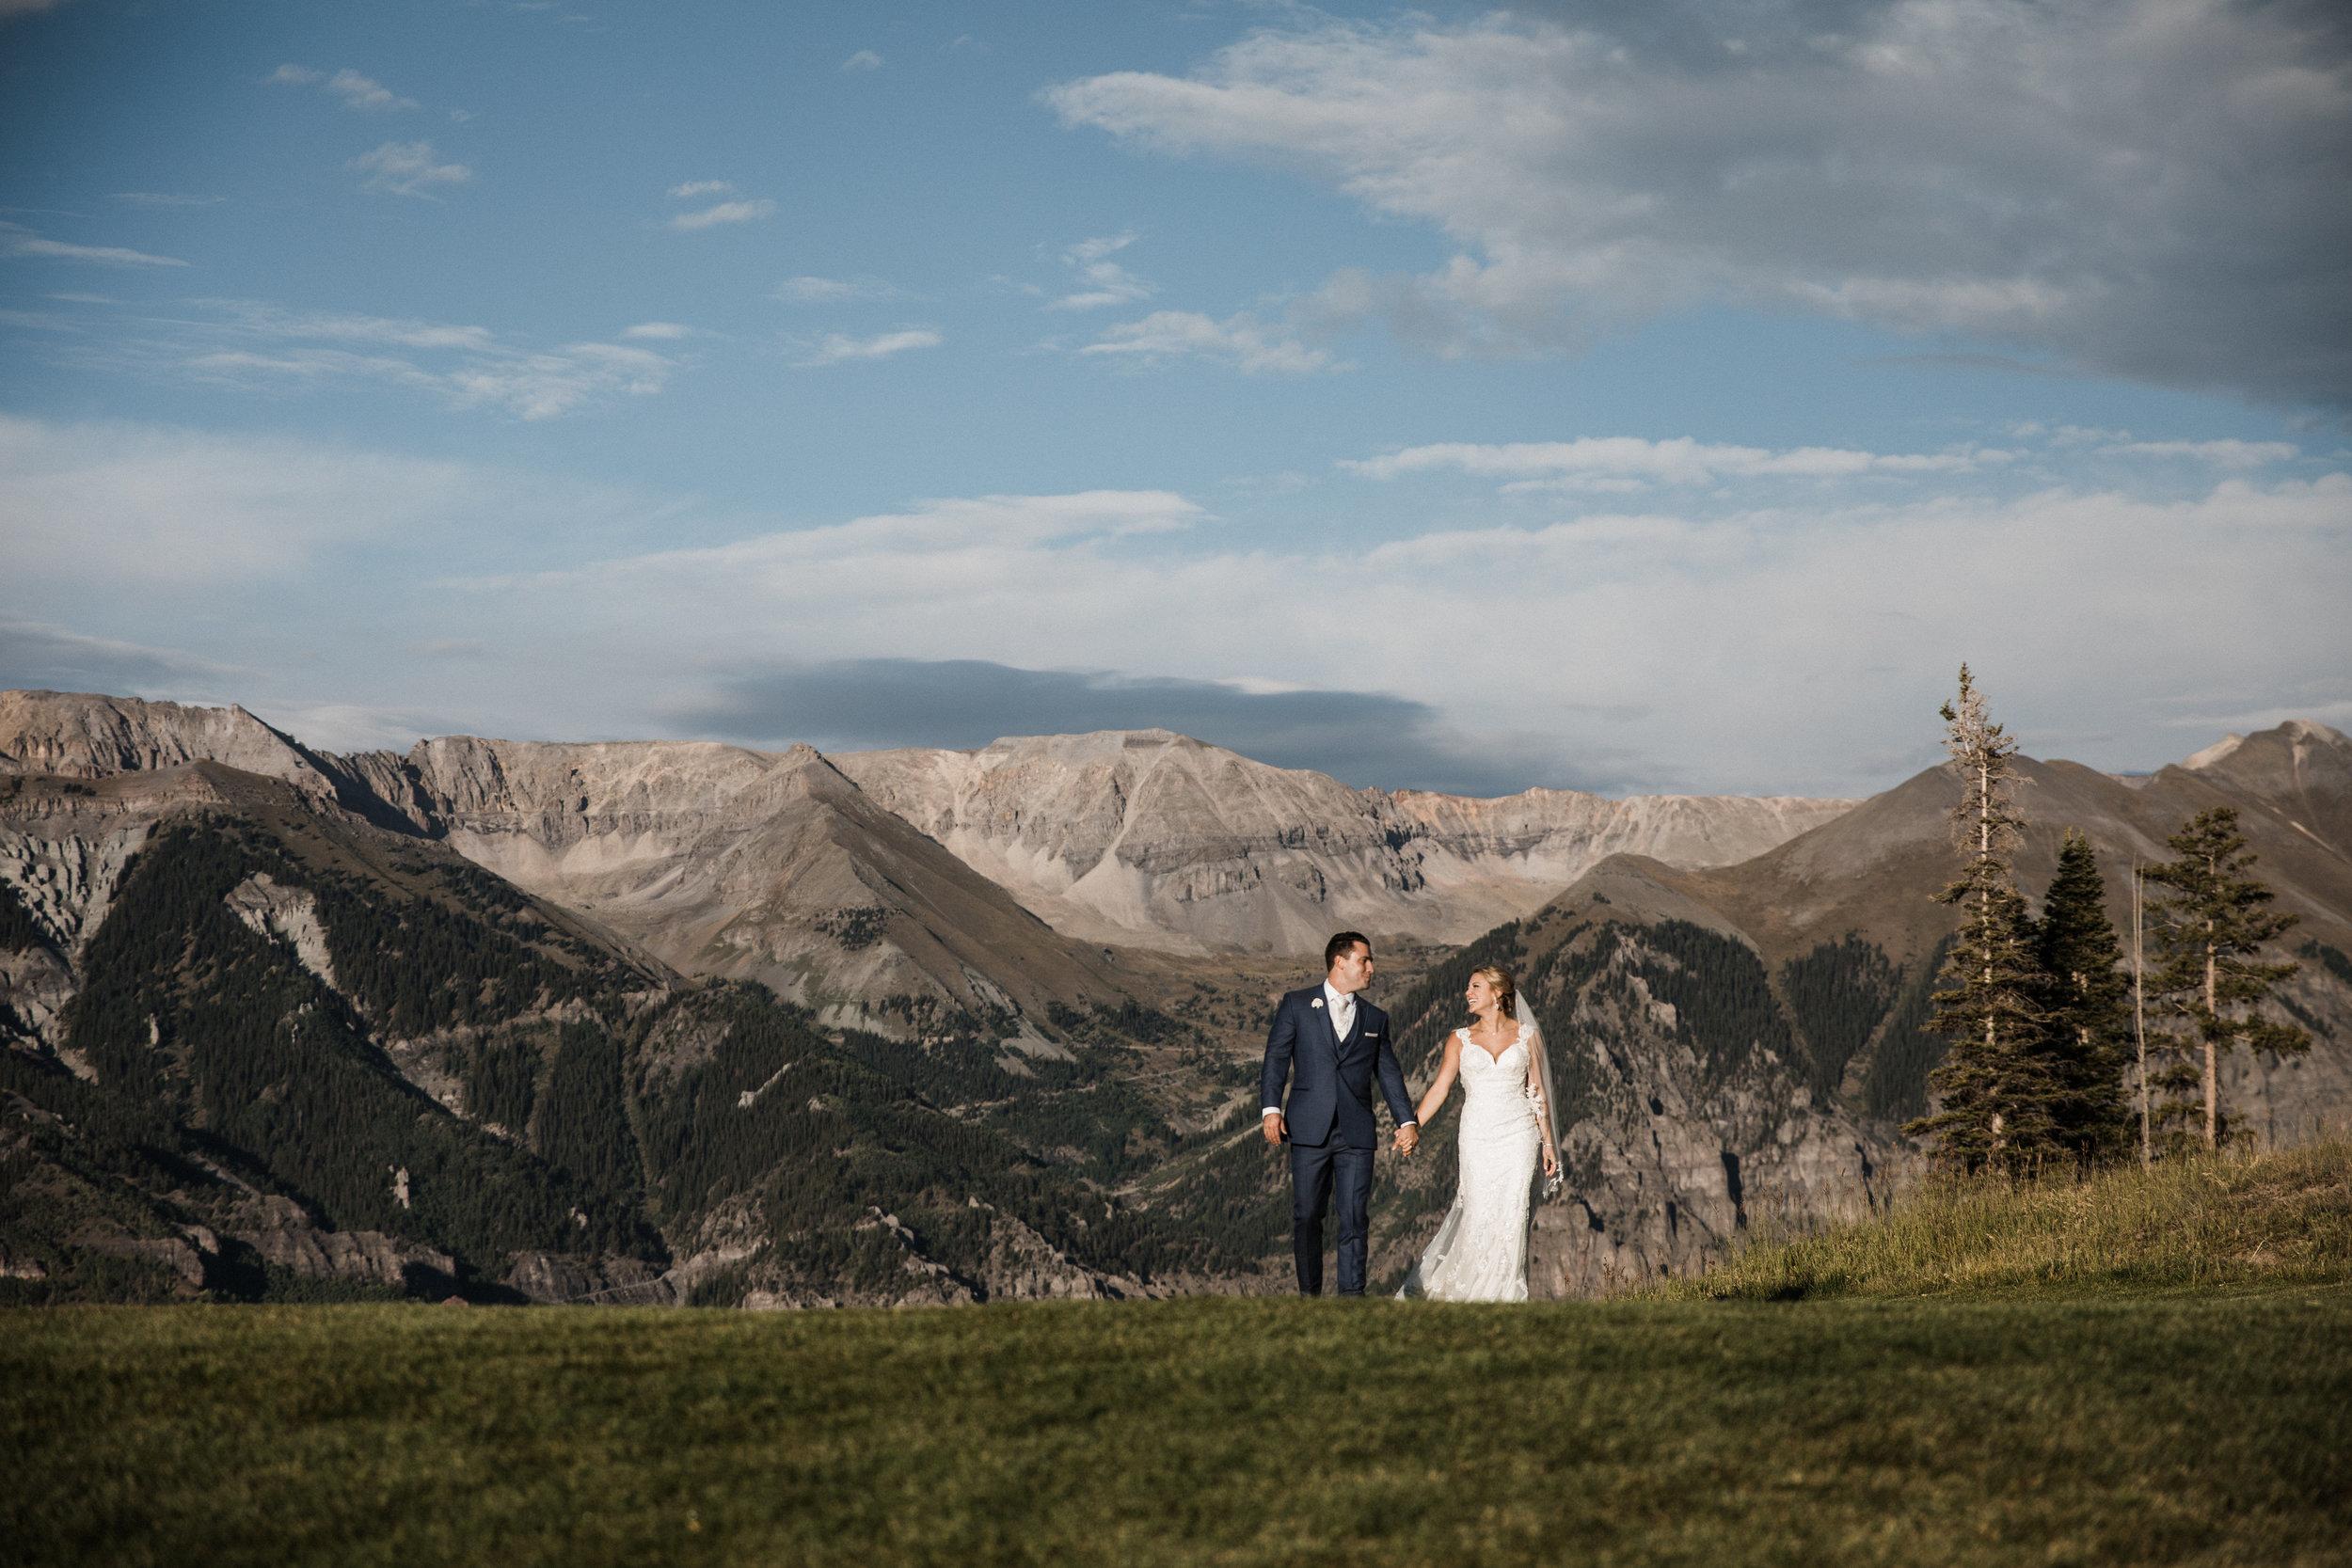 leahandashton-telluride-wedding-photography-0079.jpg